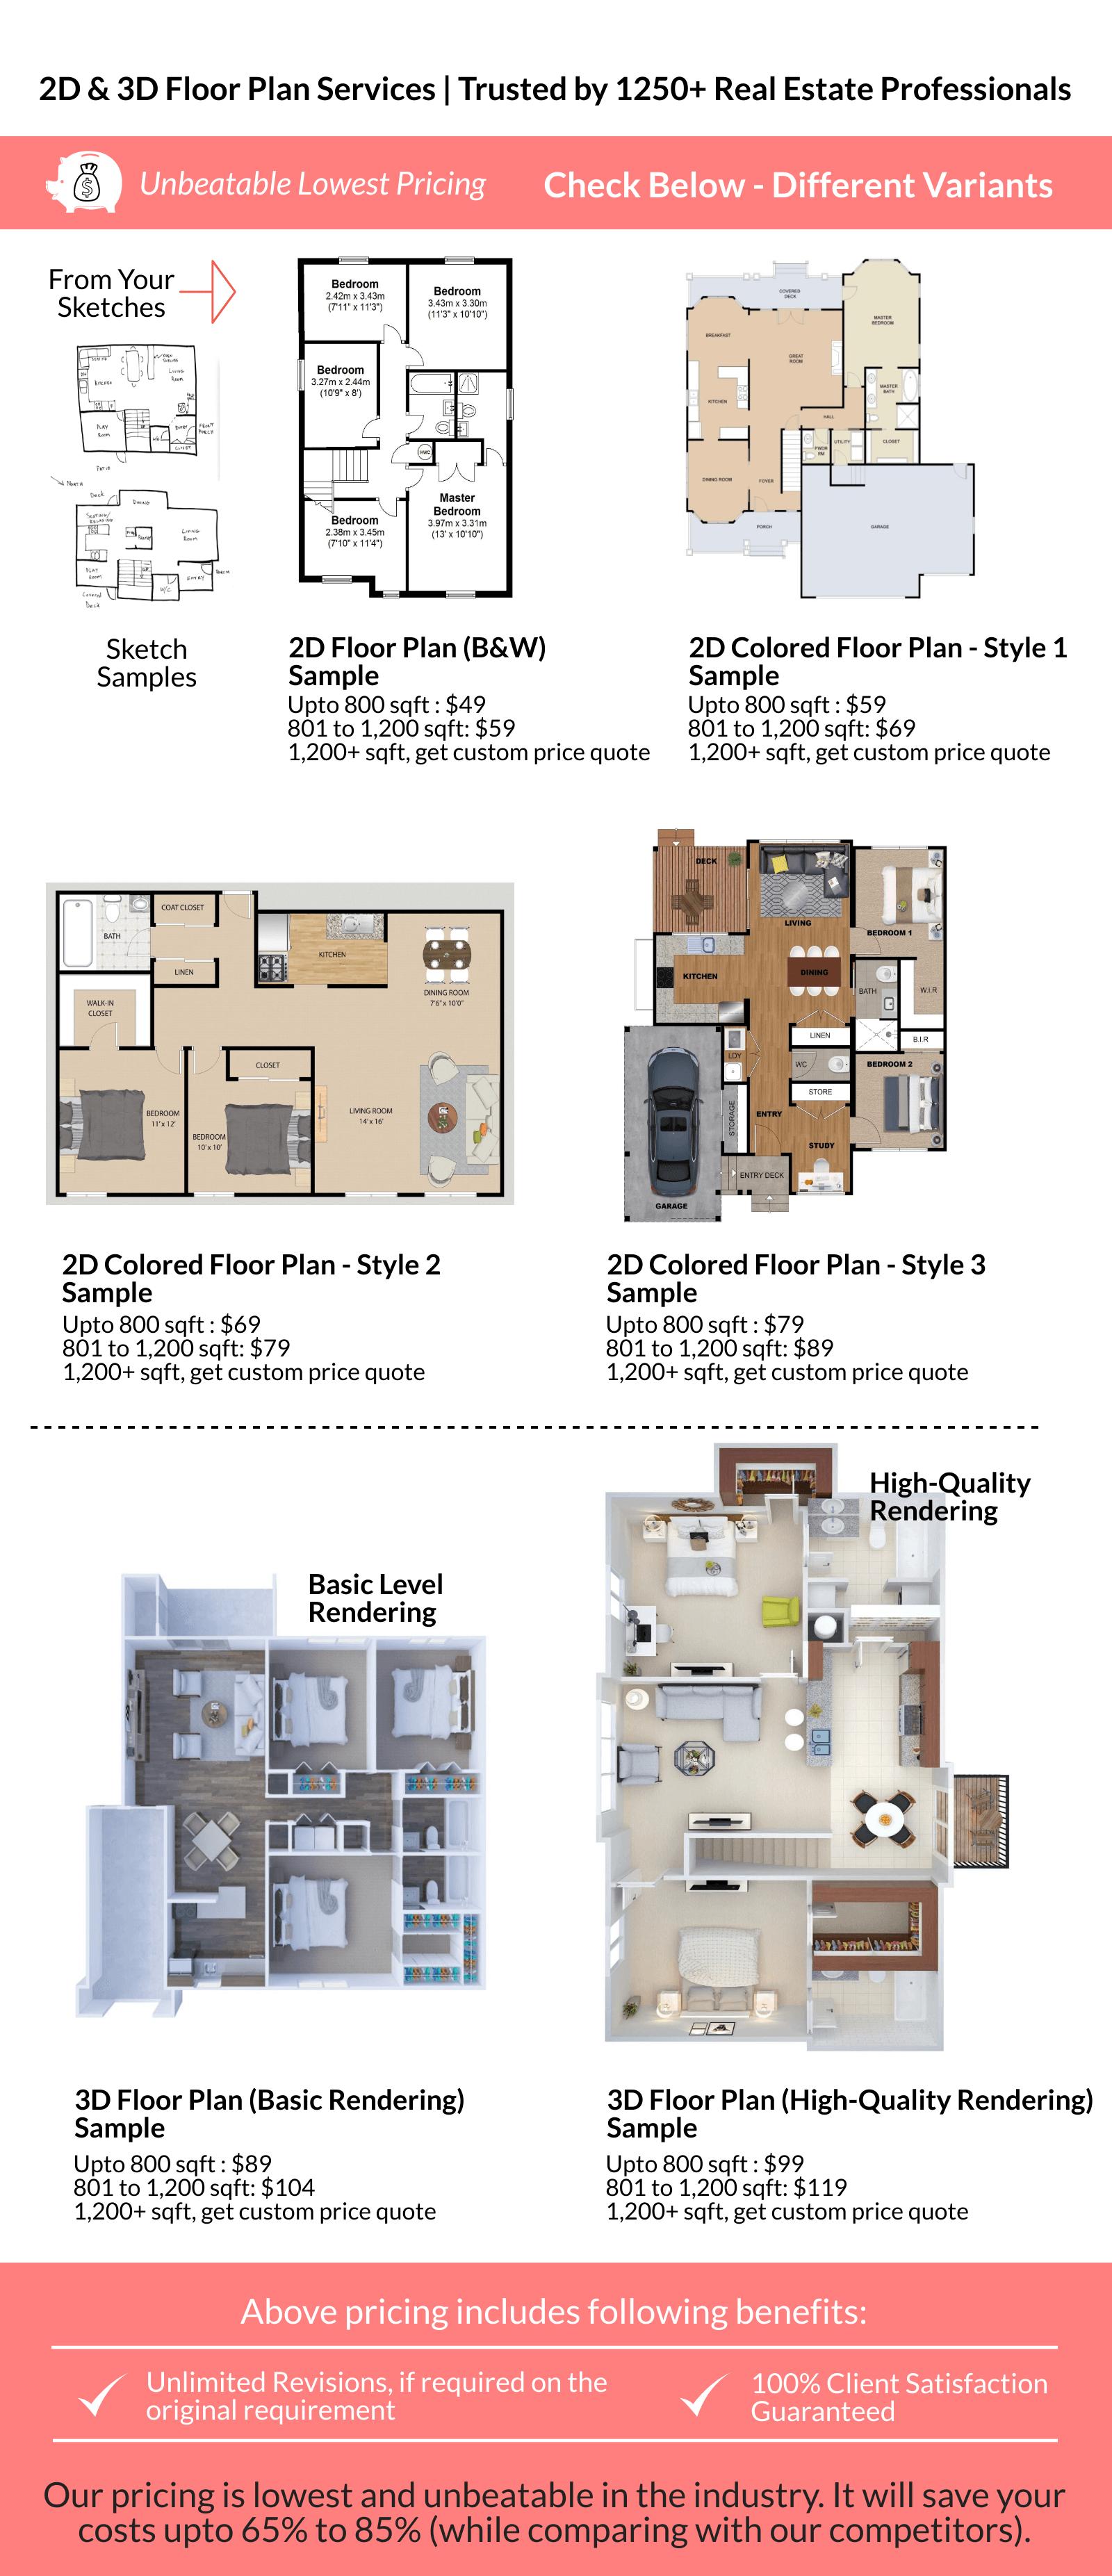 Floor Plans for Realtors